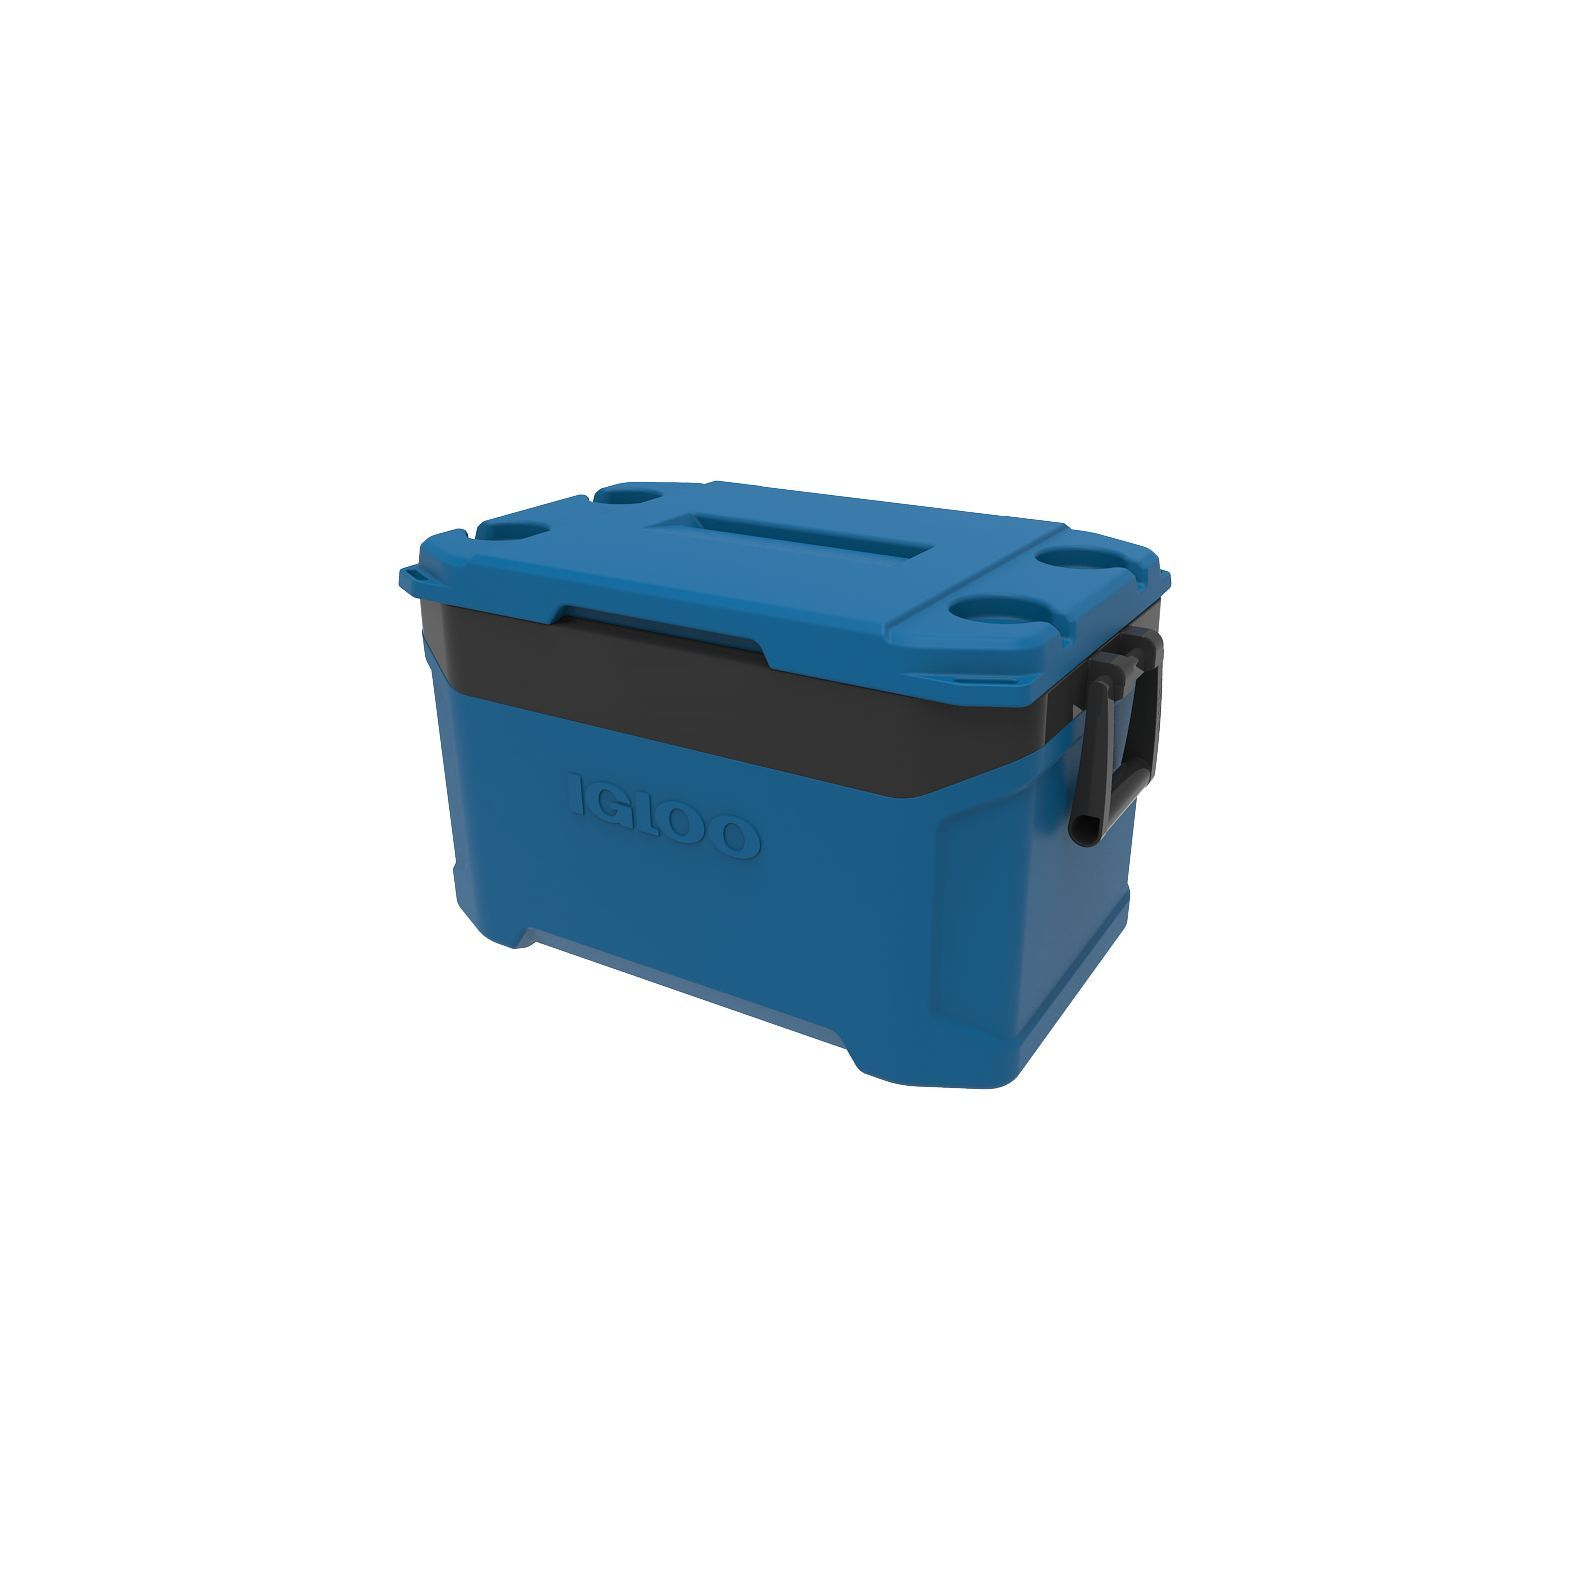 Nevera Portatil Latitude 50 Azul y Negro